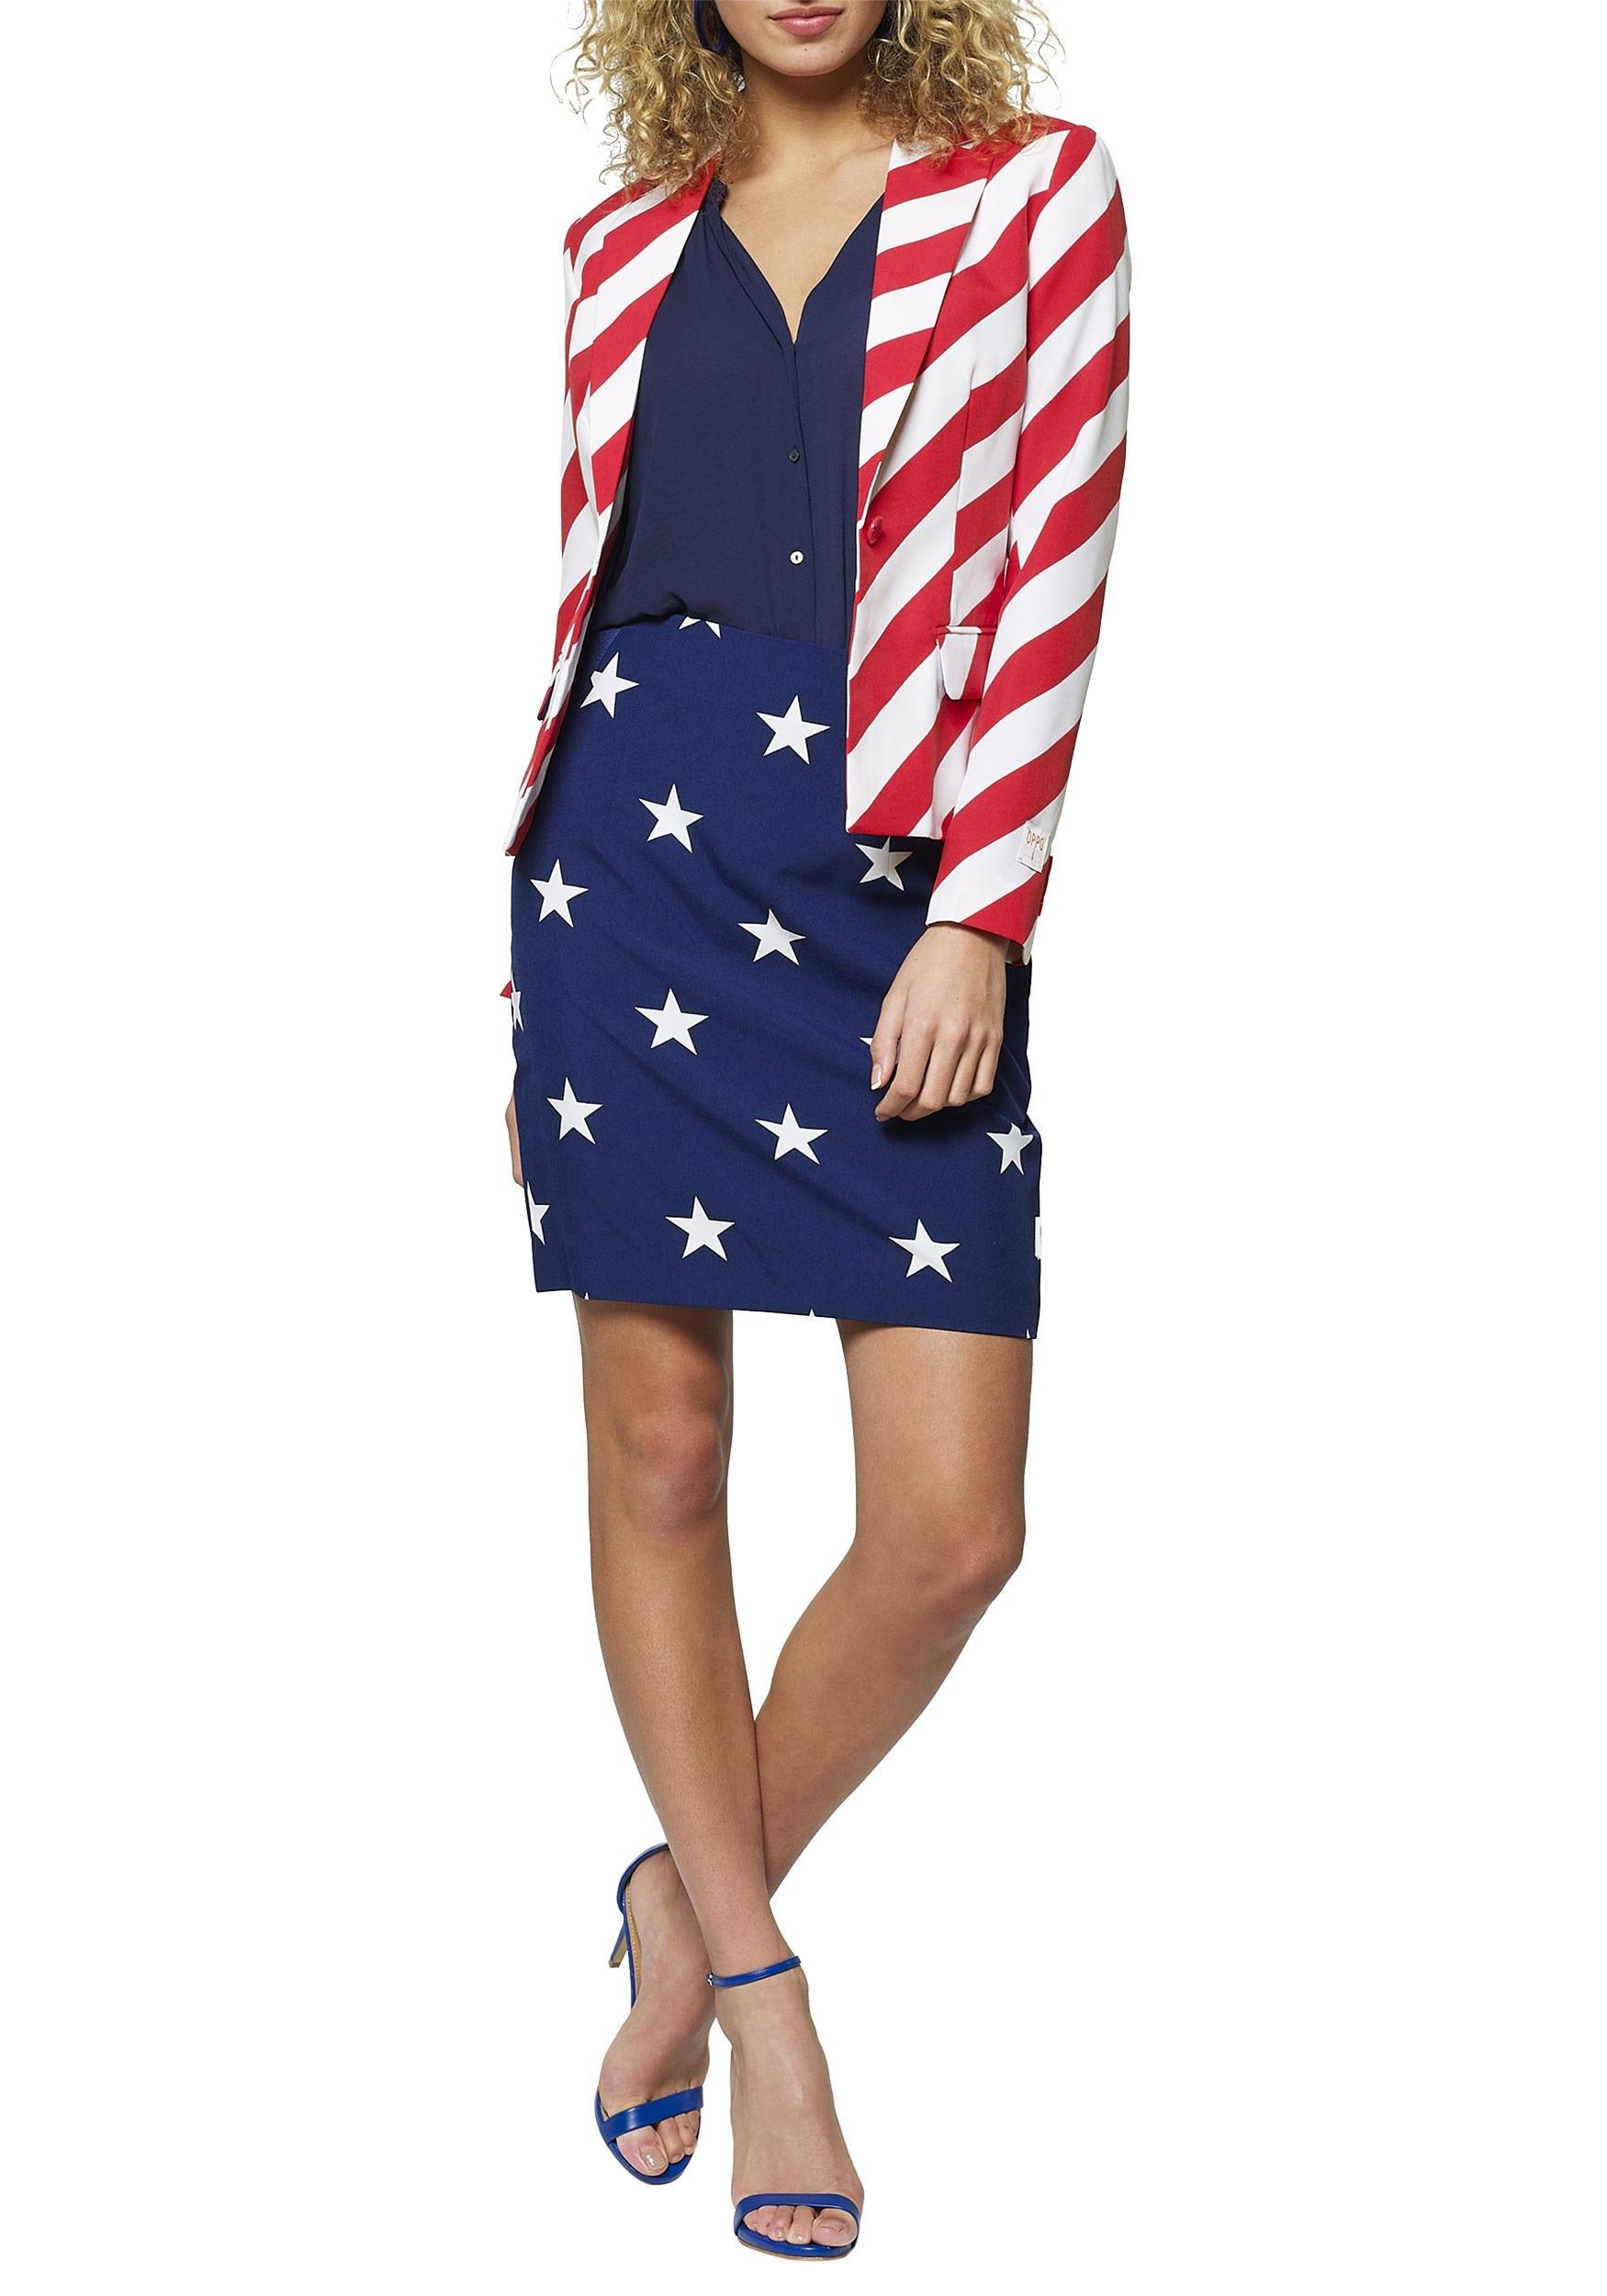 Stars and Stripes Women's OppoSuit